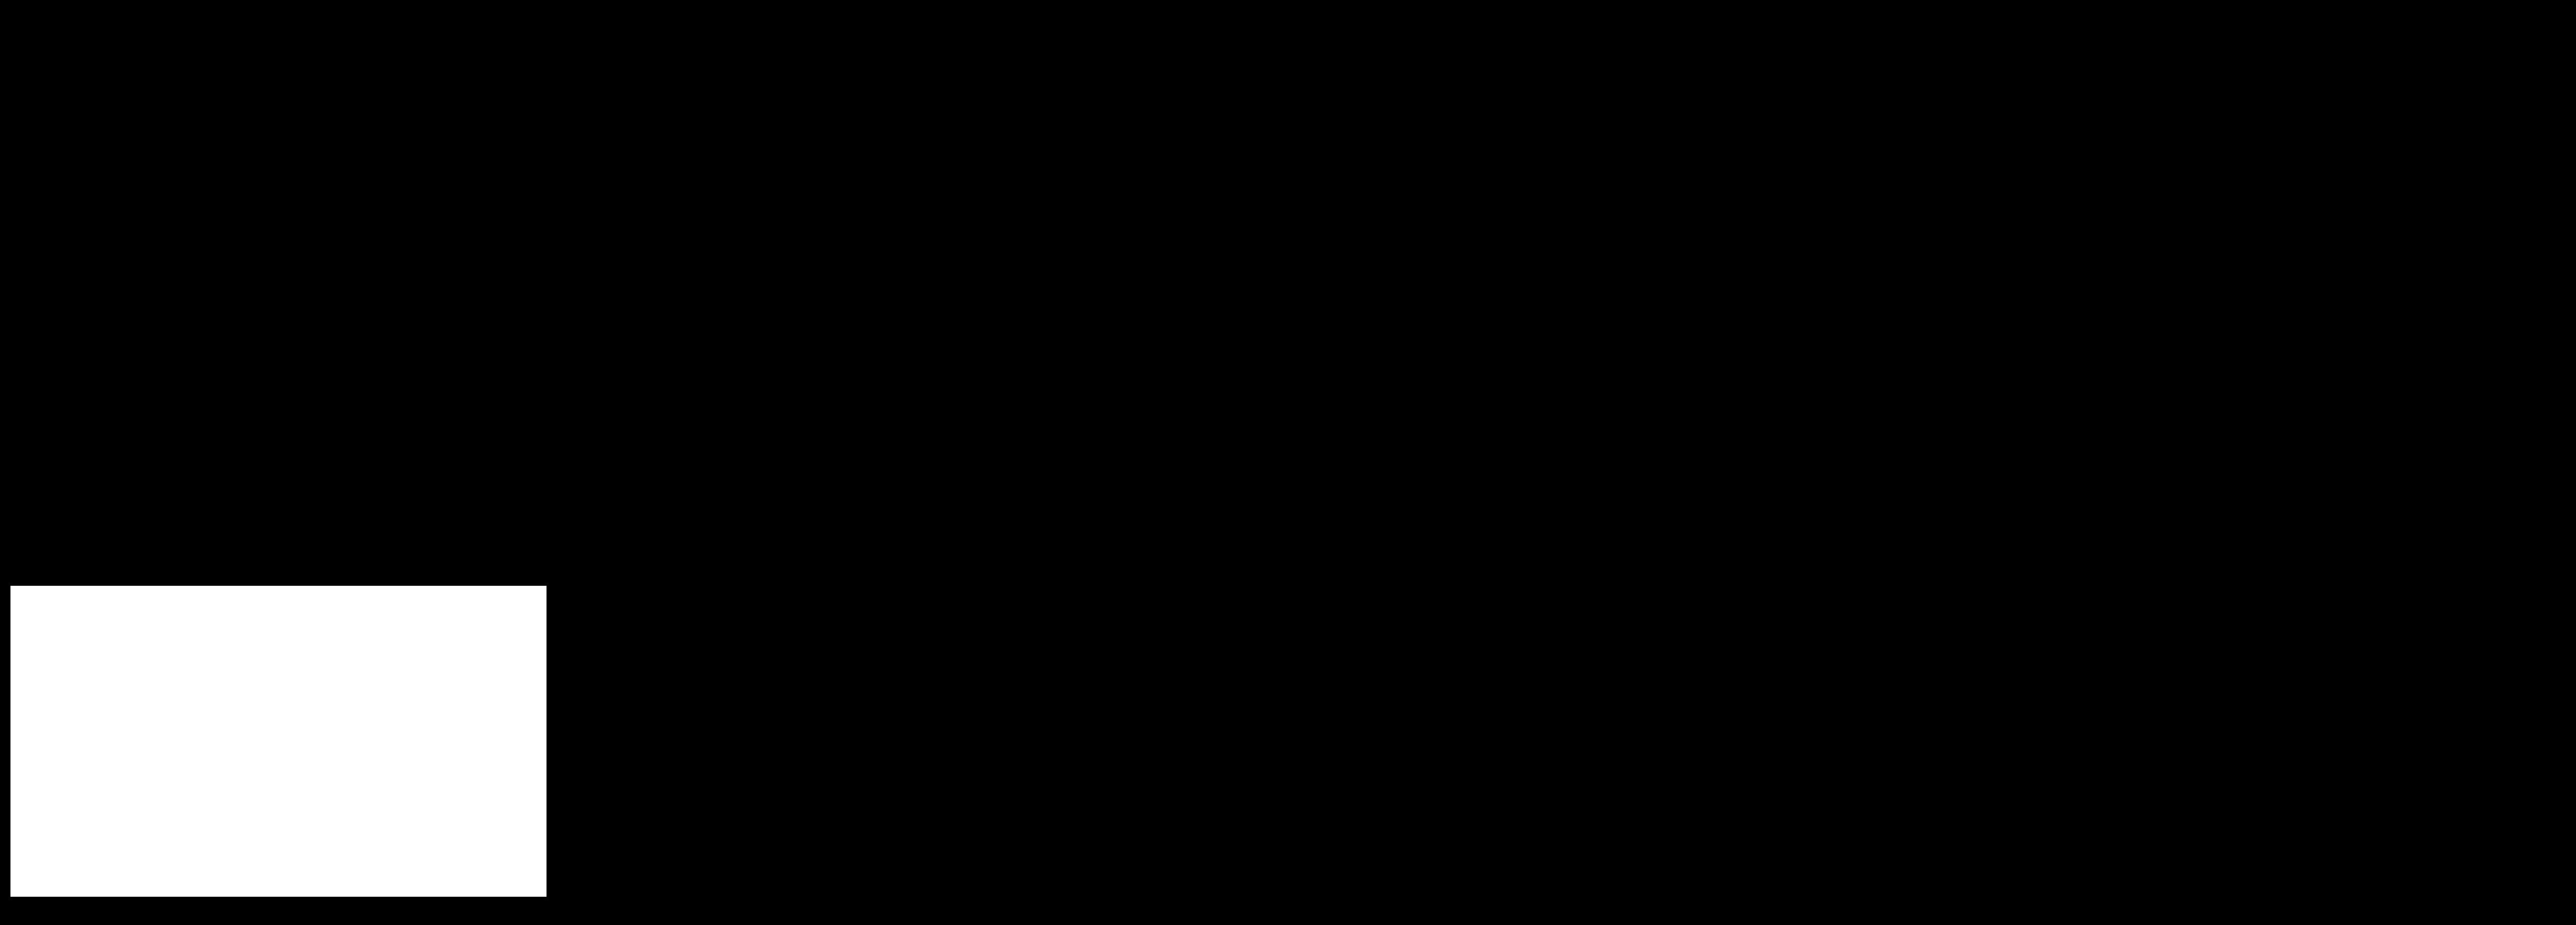 Fachini